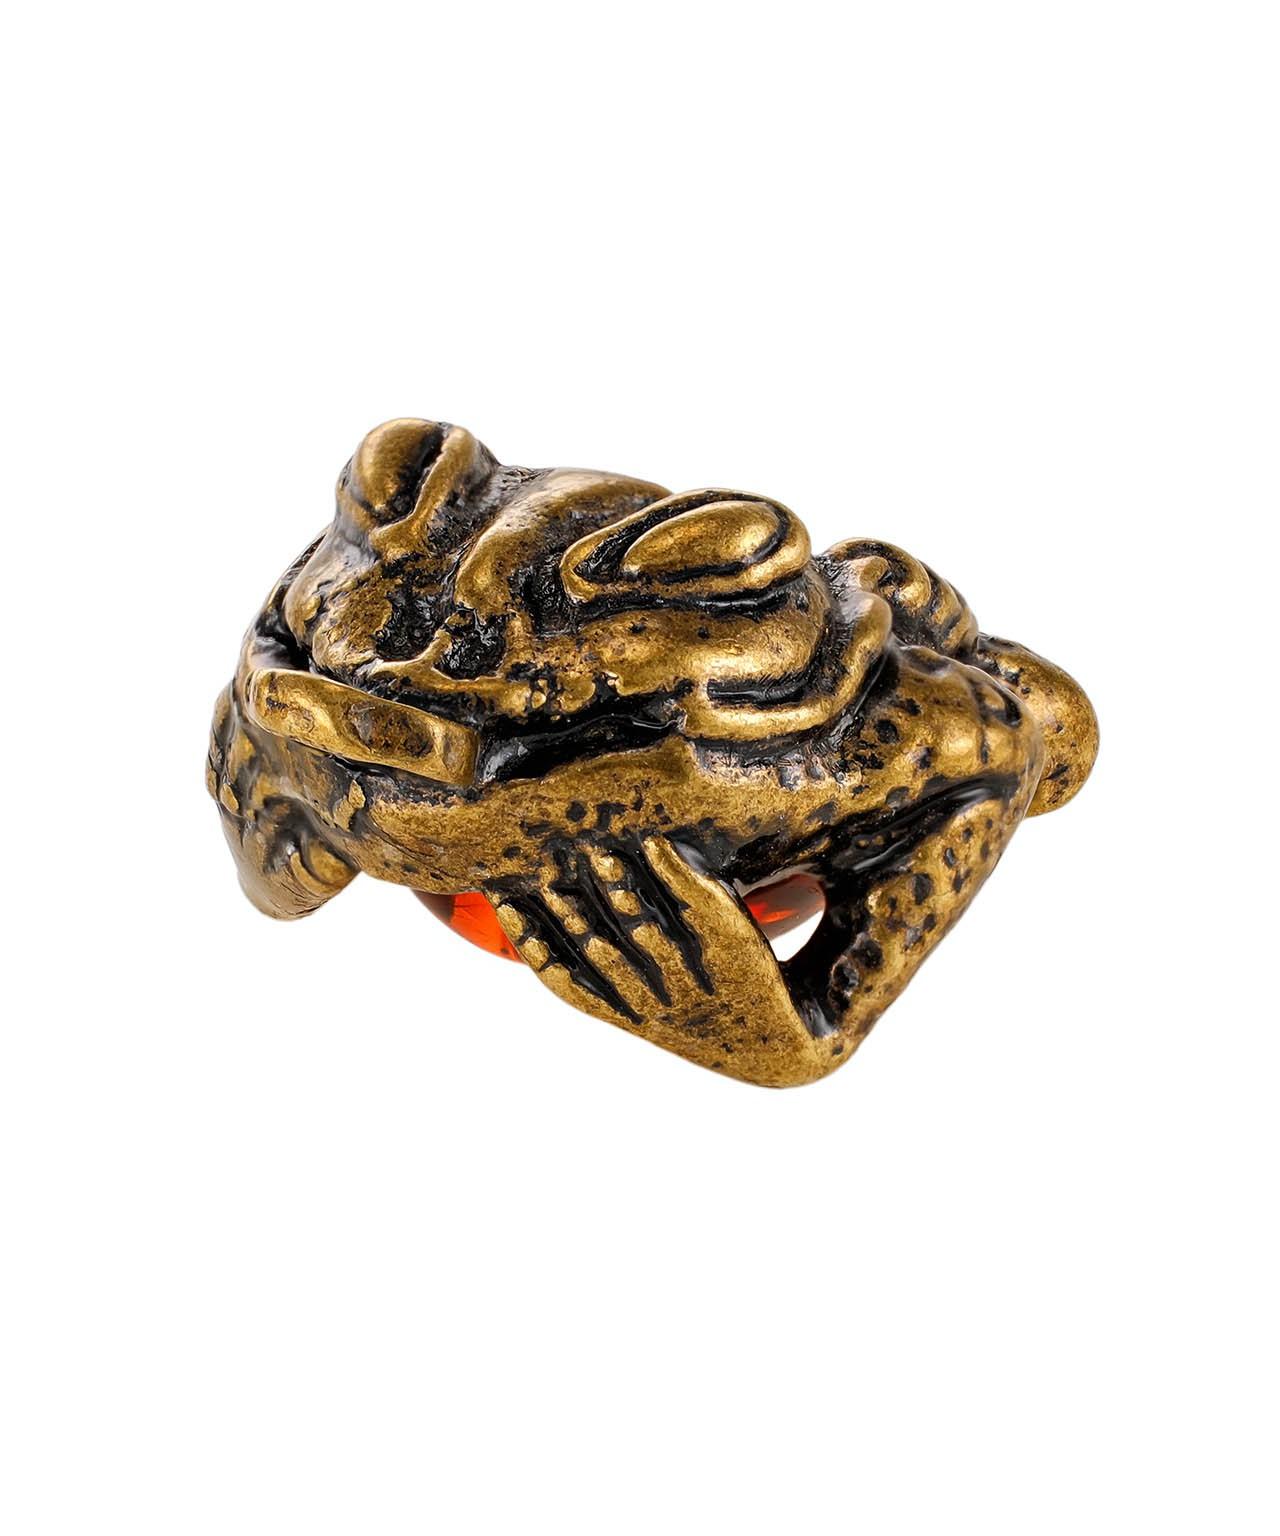 Кошельковая лягушка фен-шуй 569